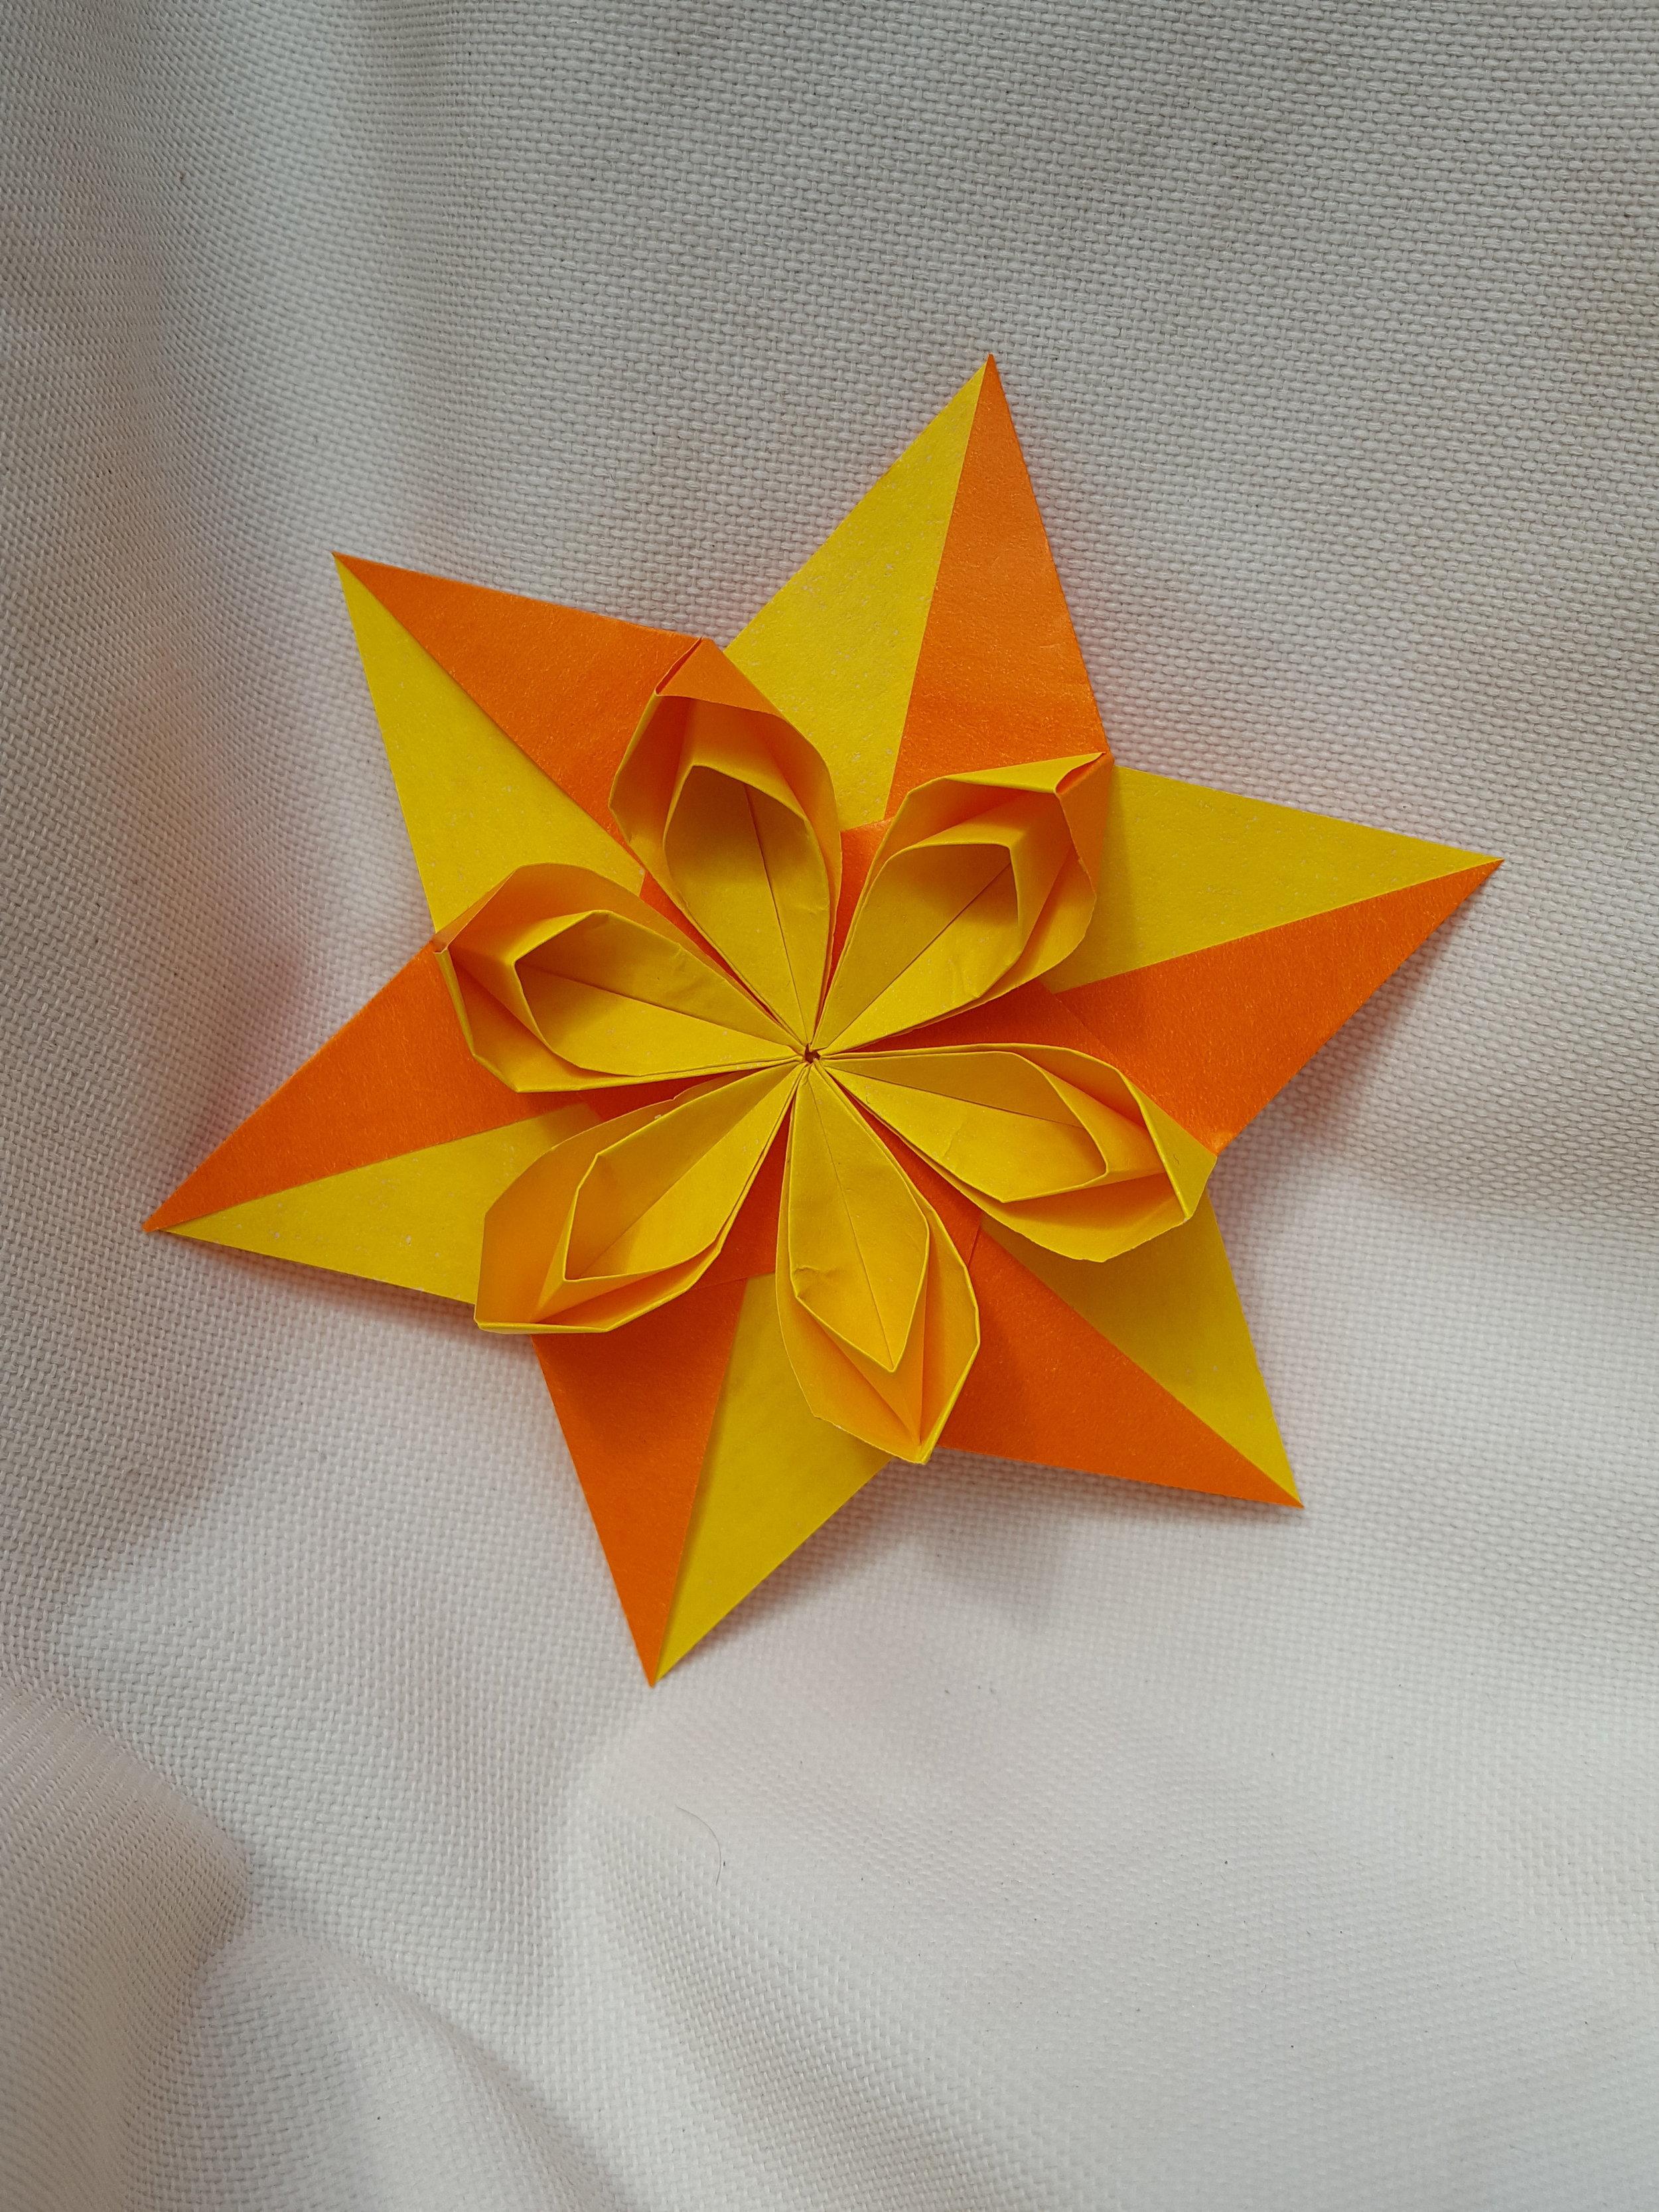 3 Ways to Make Modular Origami - wikiHow | 1333x1000